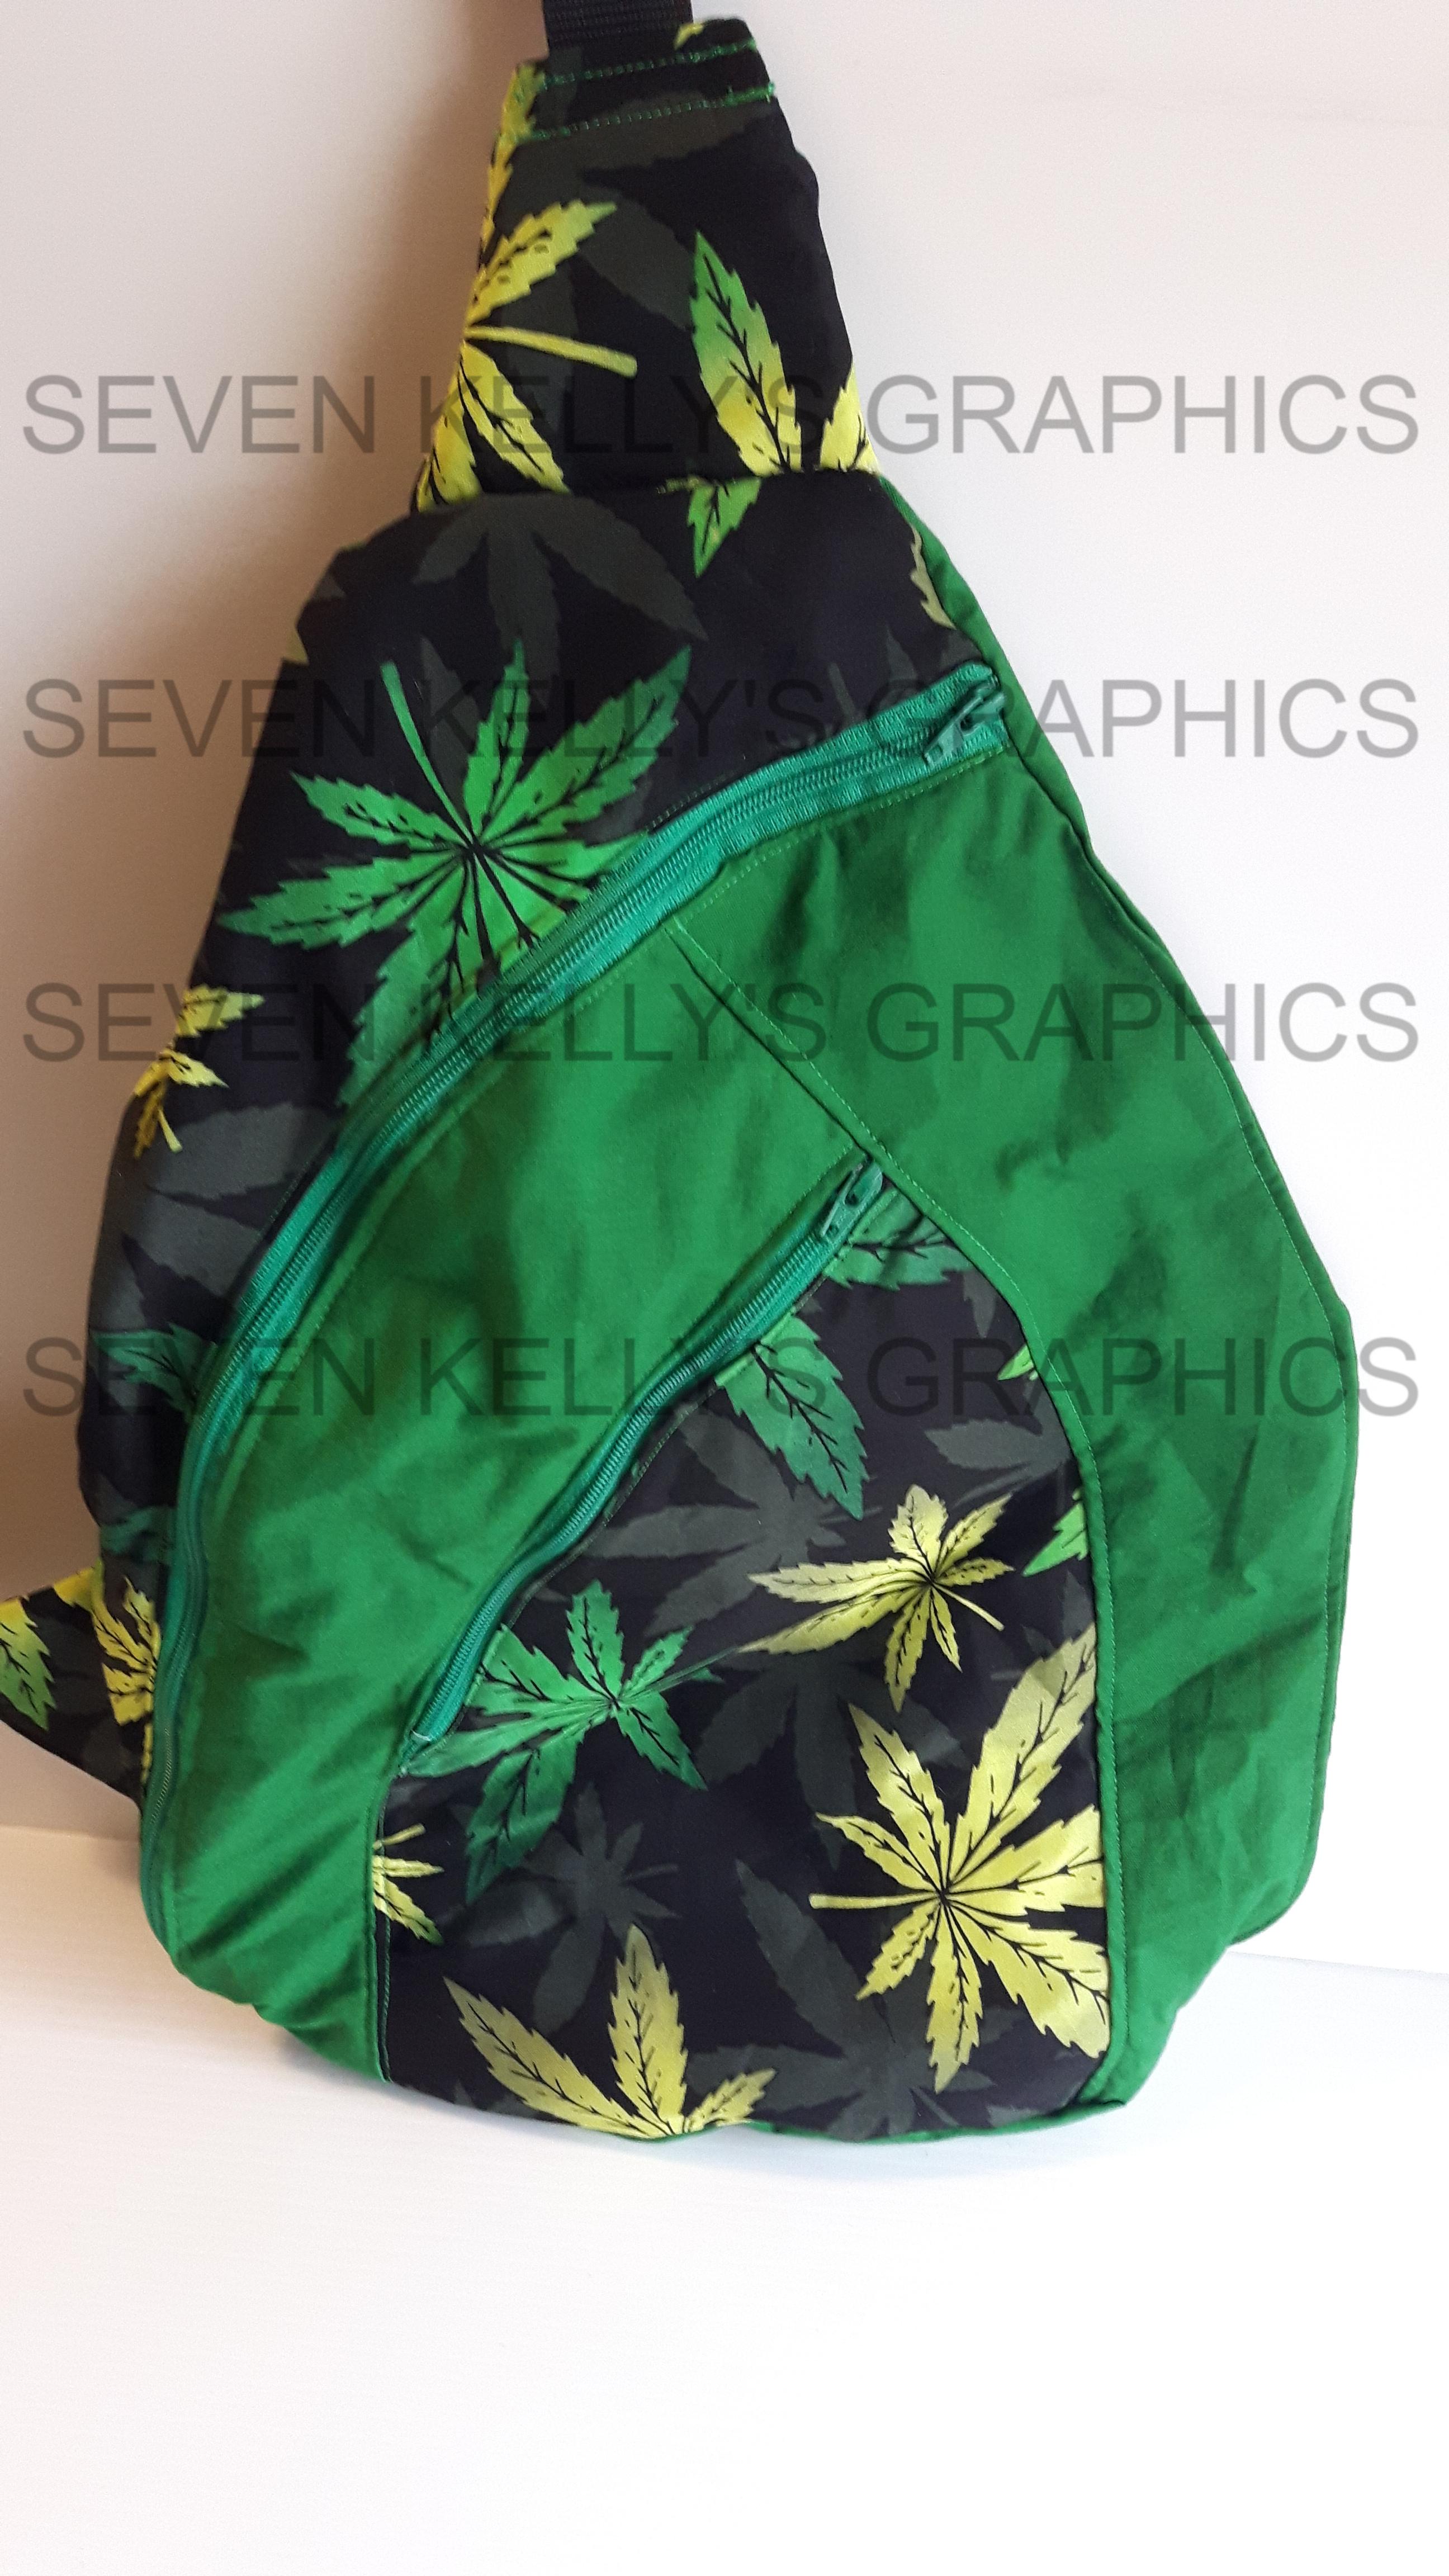 Greenweed5